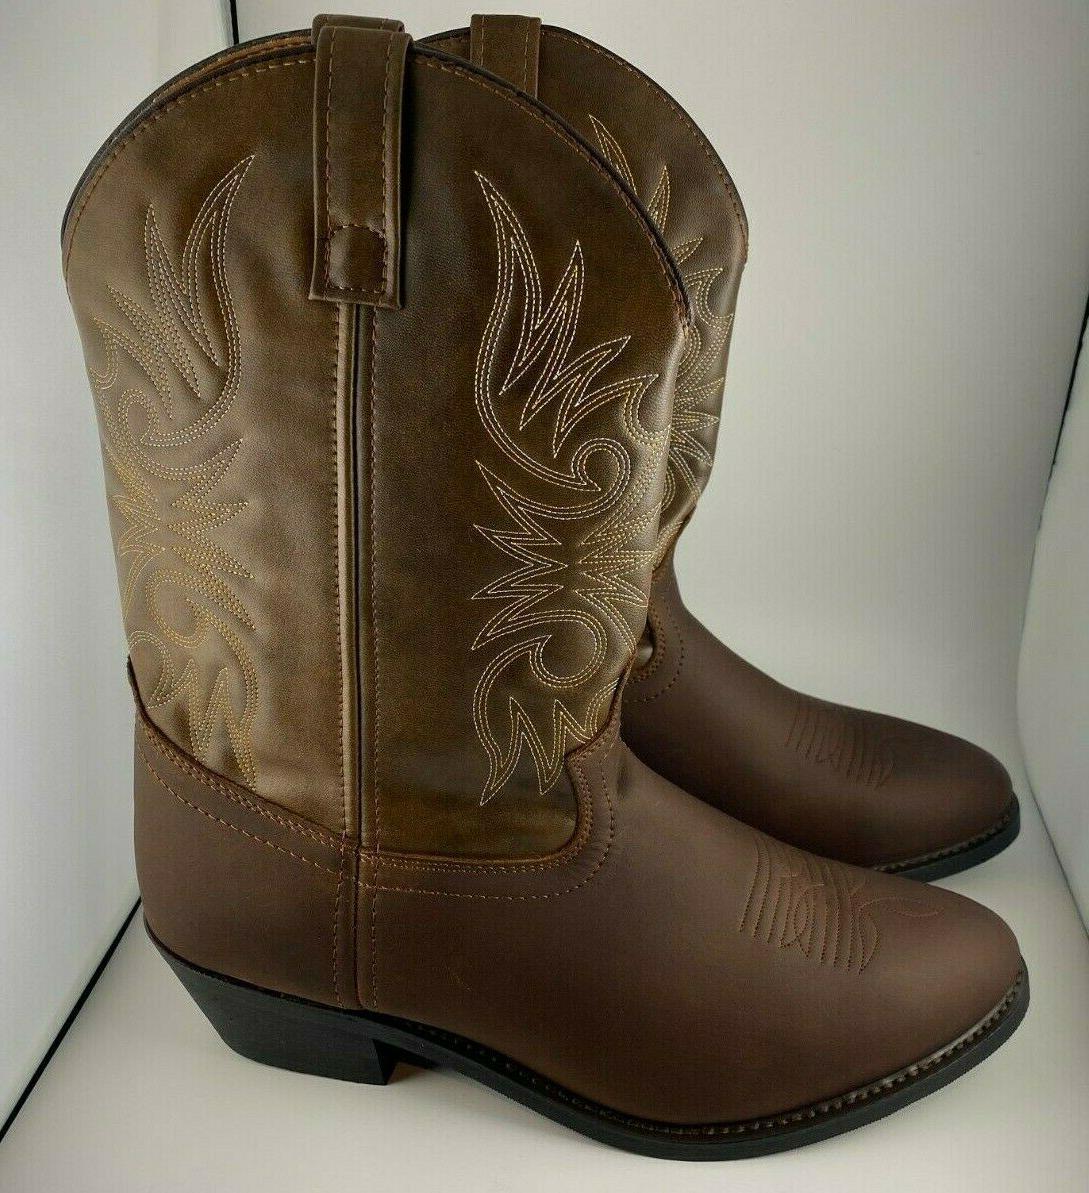 Men's Laredo Western Cowboy Boots Wide